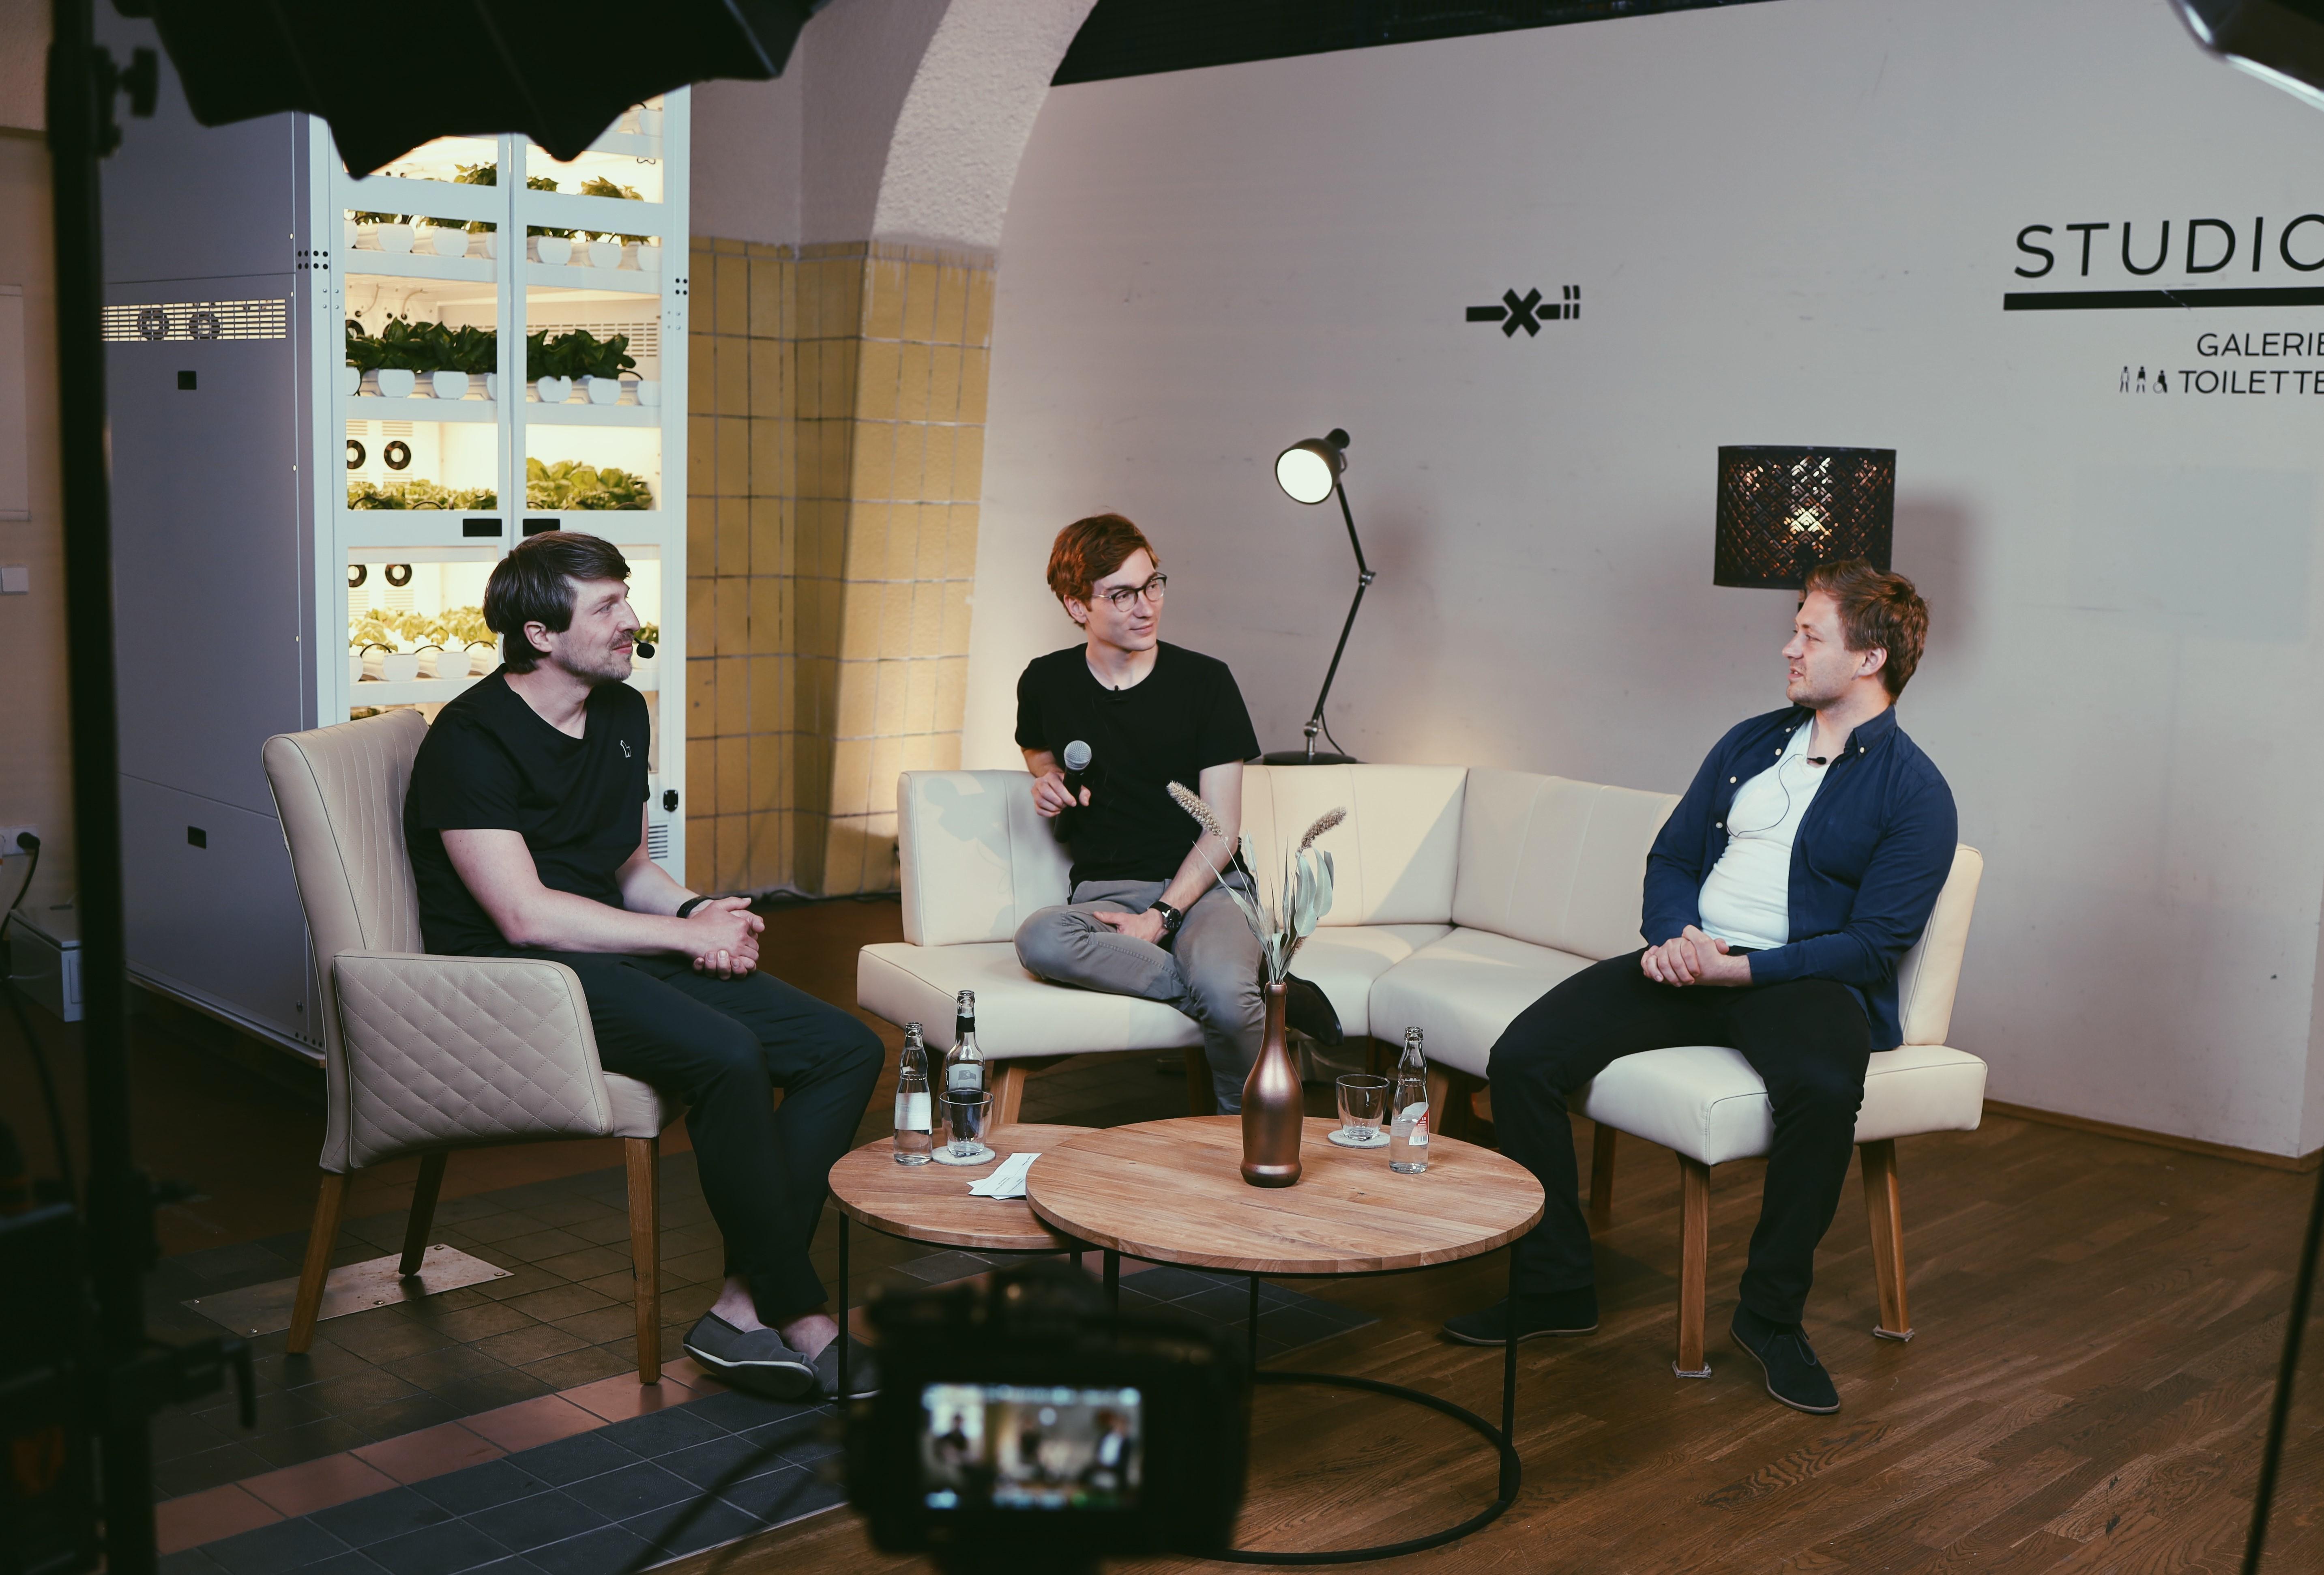 Martin Jaehnert, Marco Weicholdt, Maximilian Krauß